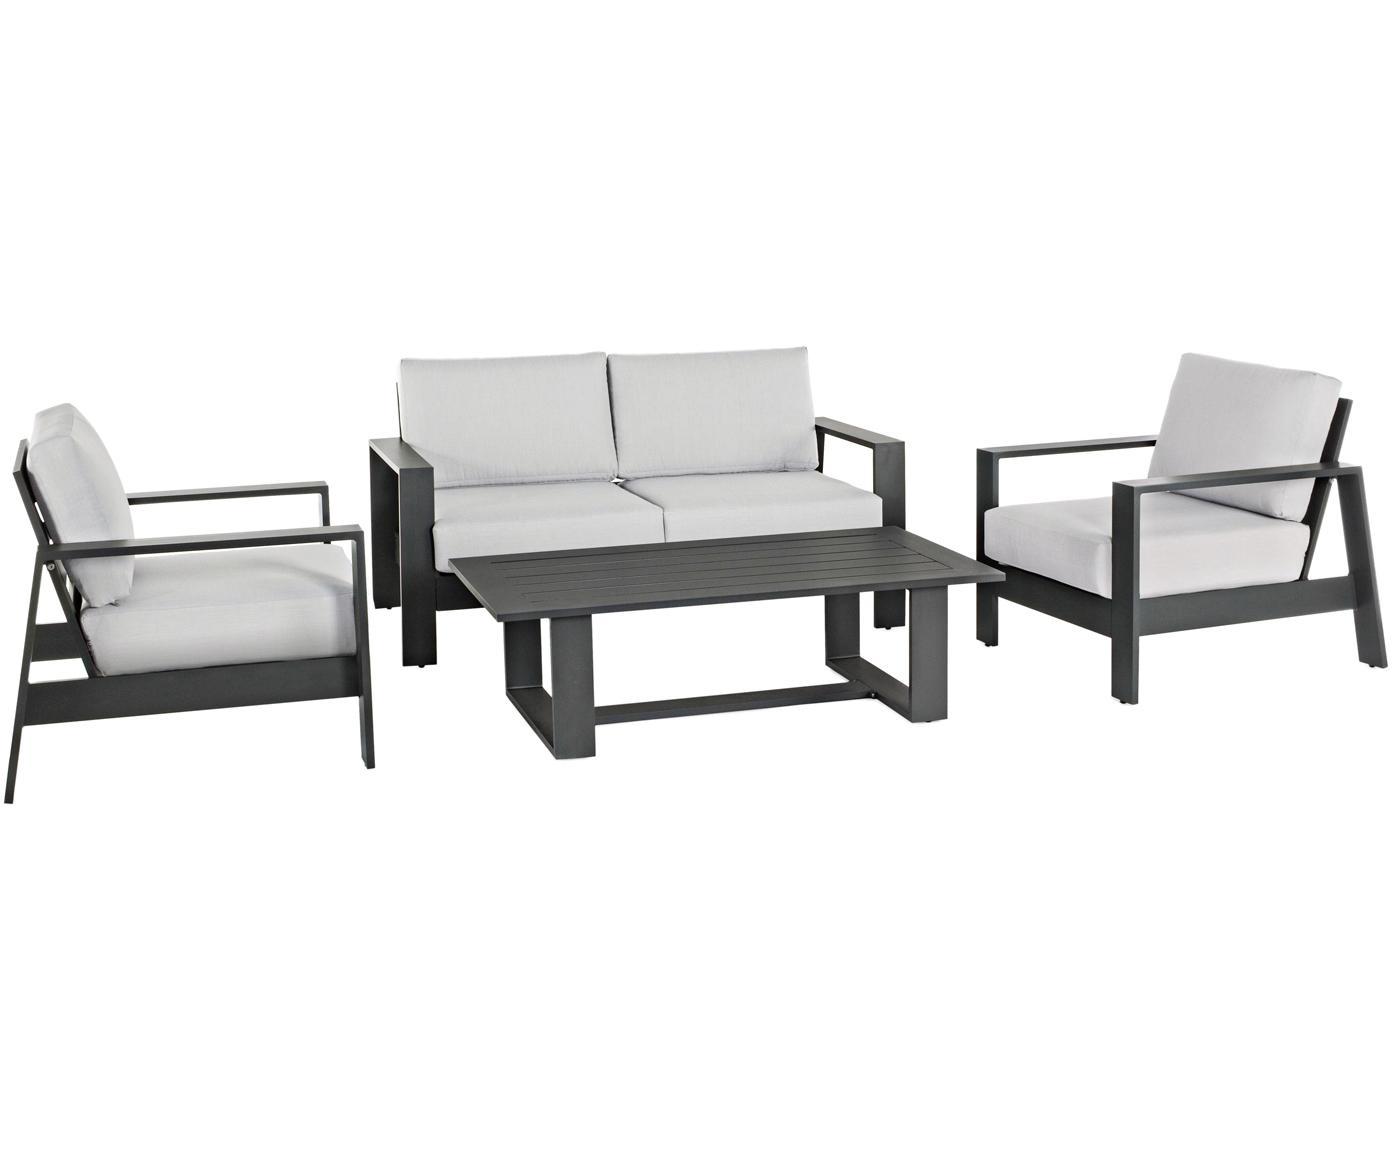 Garten-Lounge-Set Atlantic, 4-tlg., Gestell: Aluminium, pulverbeschich, Bezug: Polyester, Anthrazit, Hellgrau, Sondergrößen